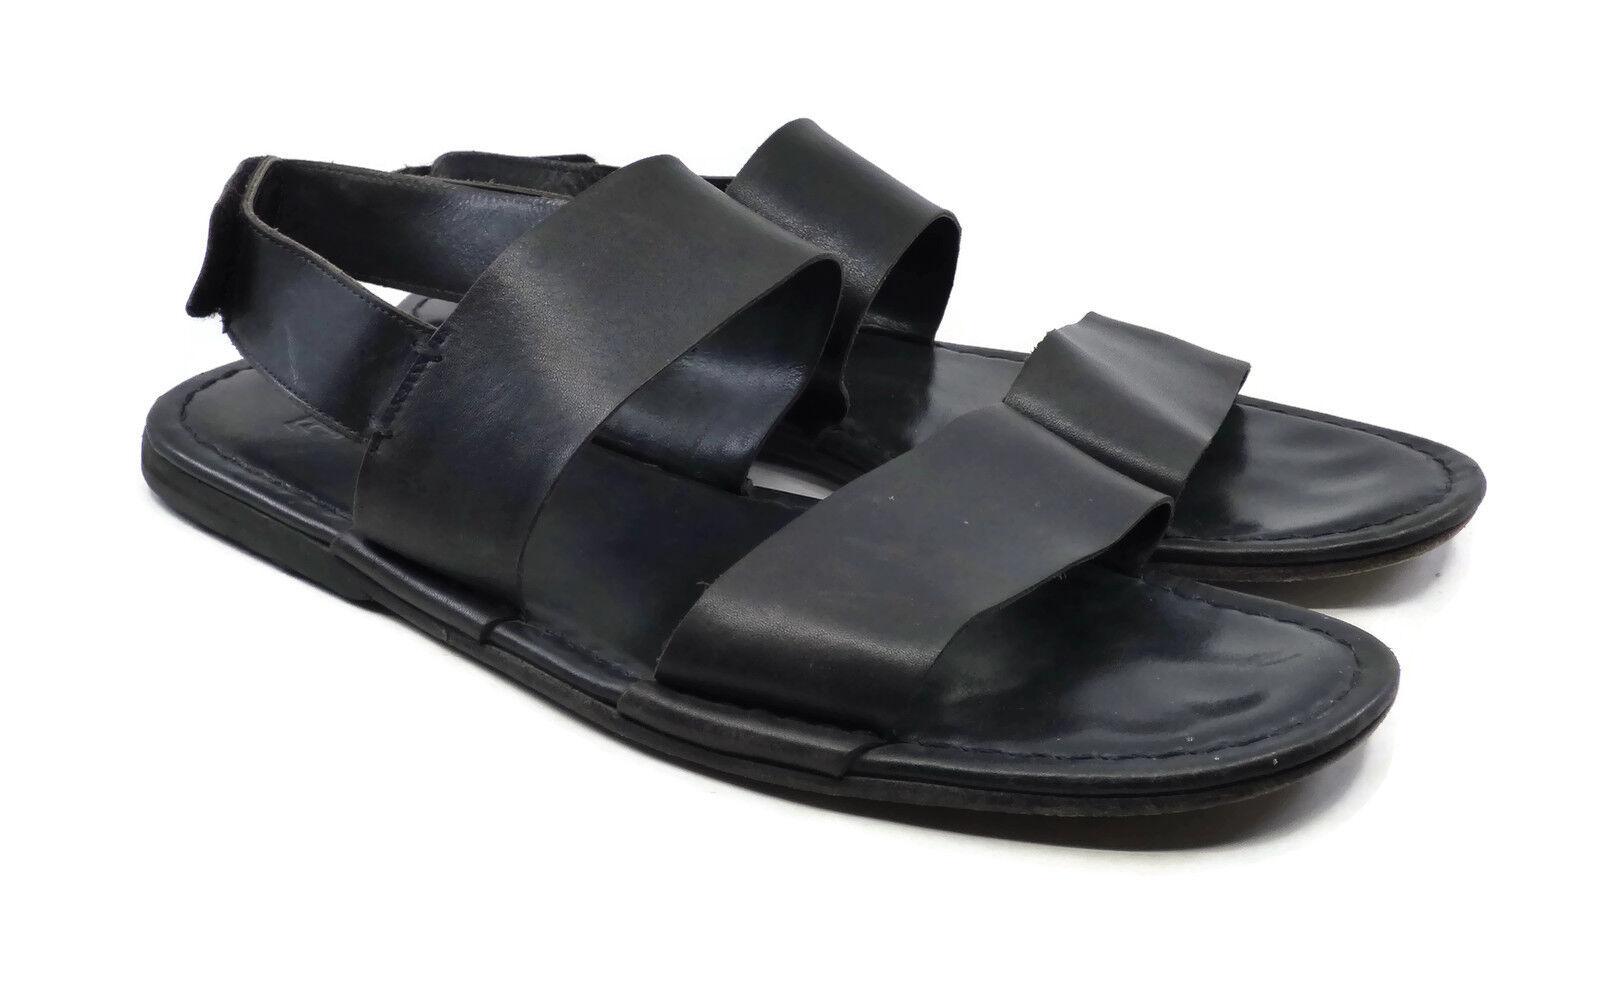 Frye Men's Men's Men's Black Leather Strap Sandals Size 11 M Made in Spain FRYE c40375